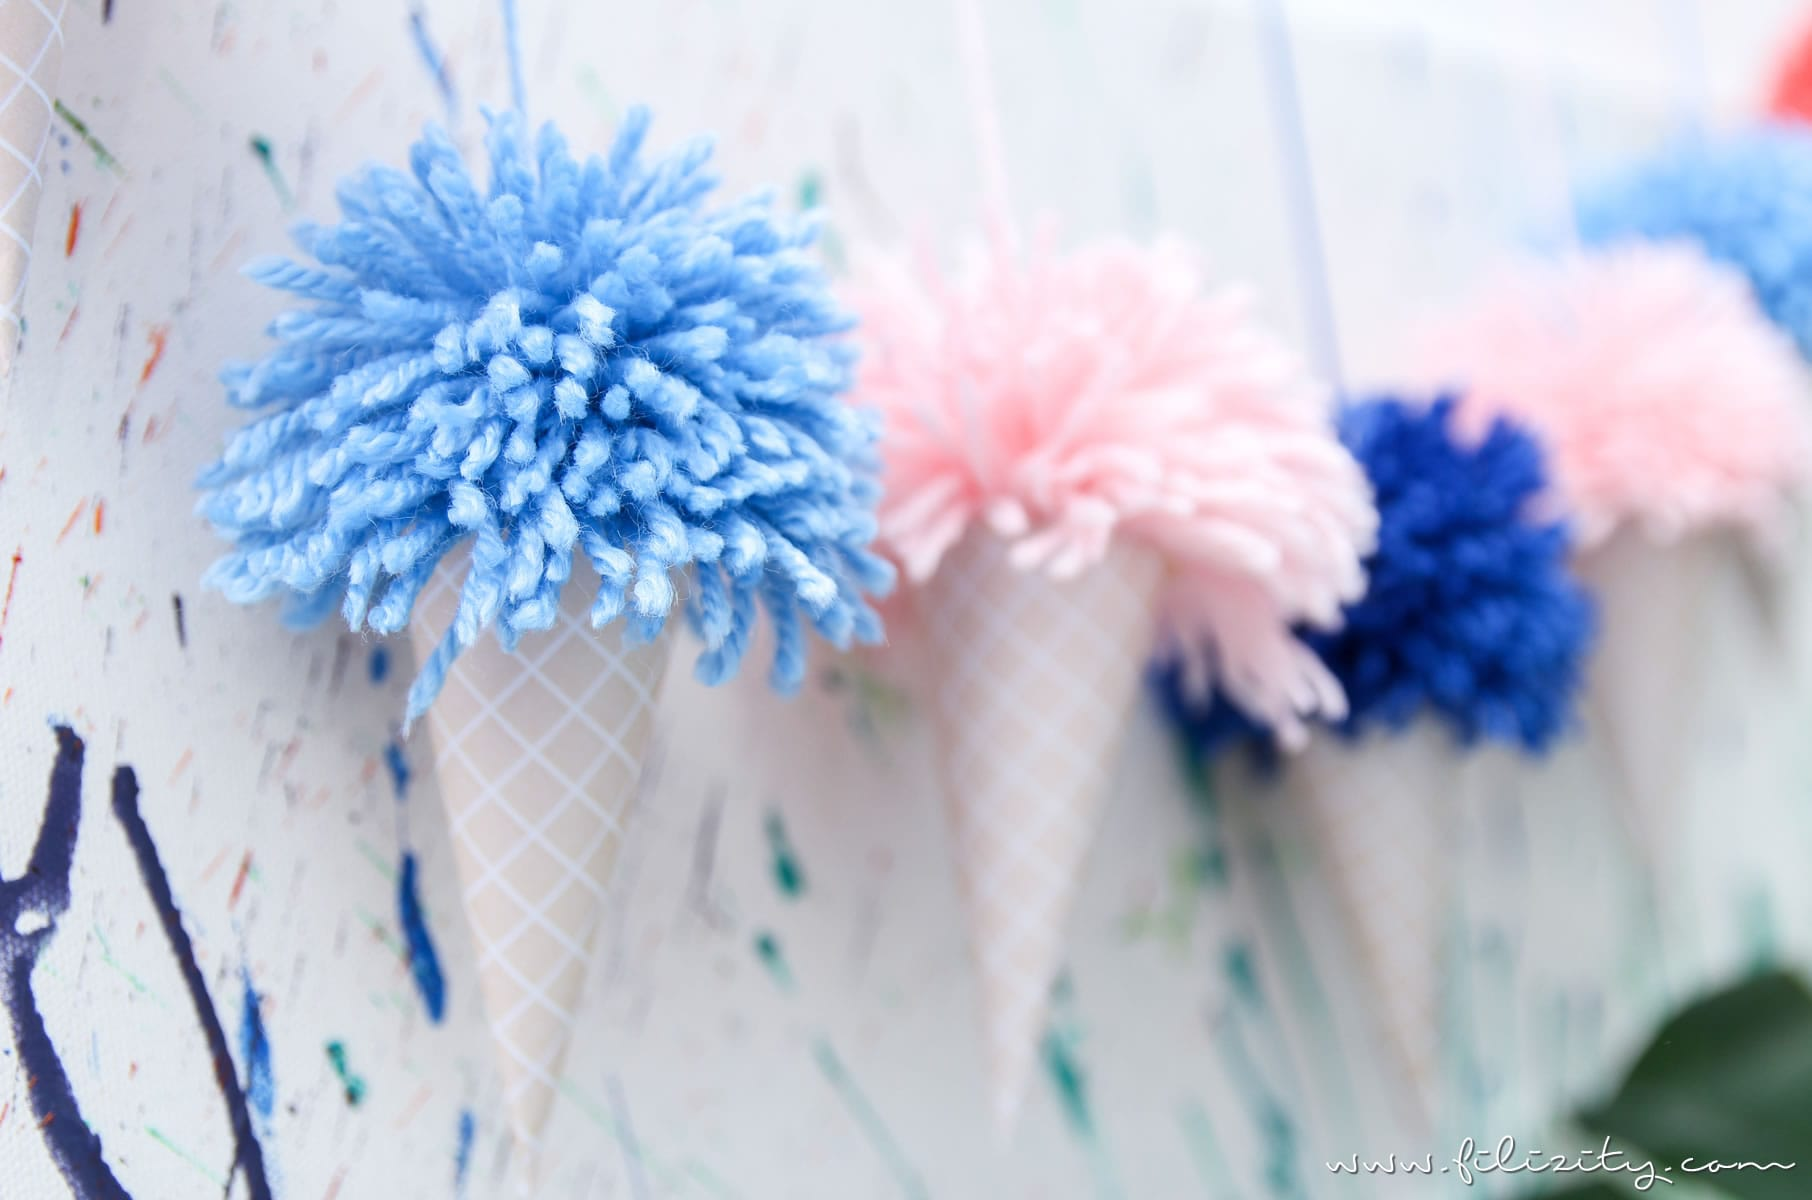 Sommer-Party: Eis-Girlande mit Pom Pons - DIY Party Deko